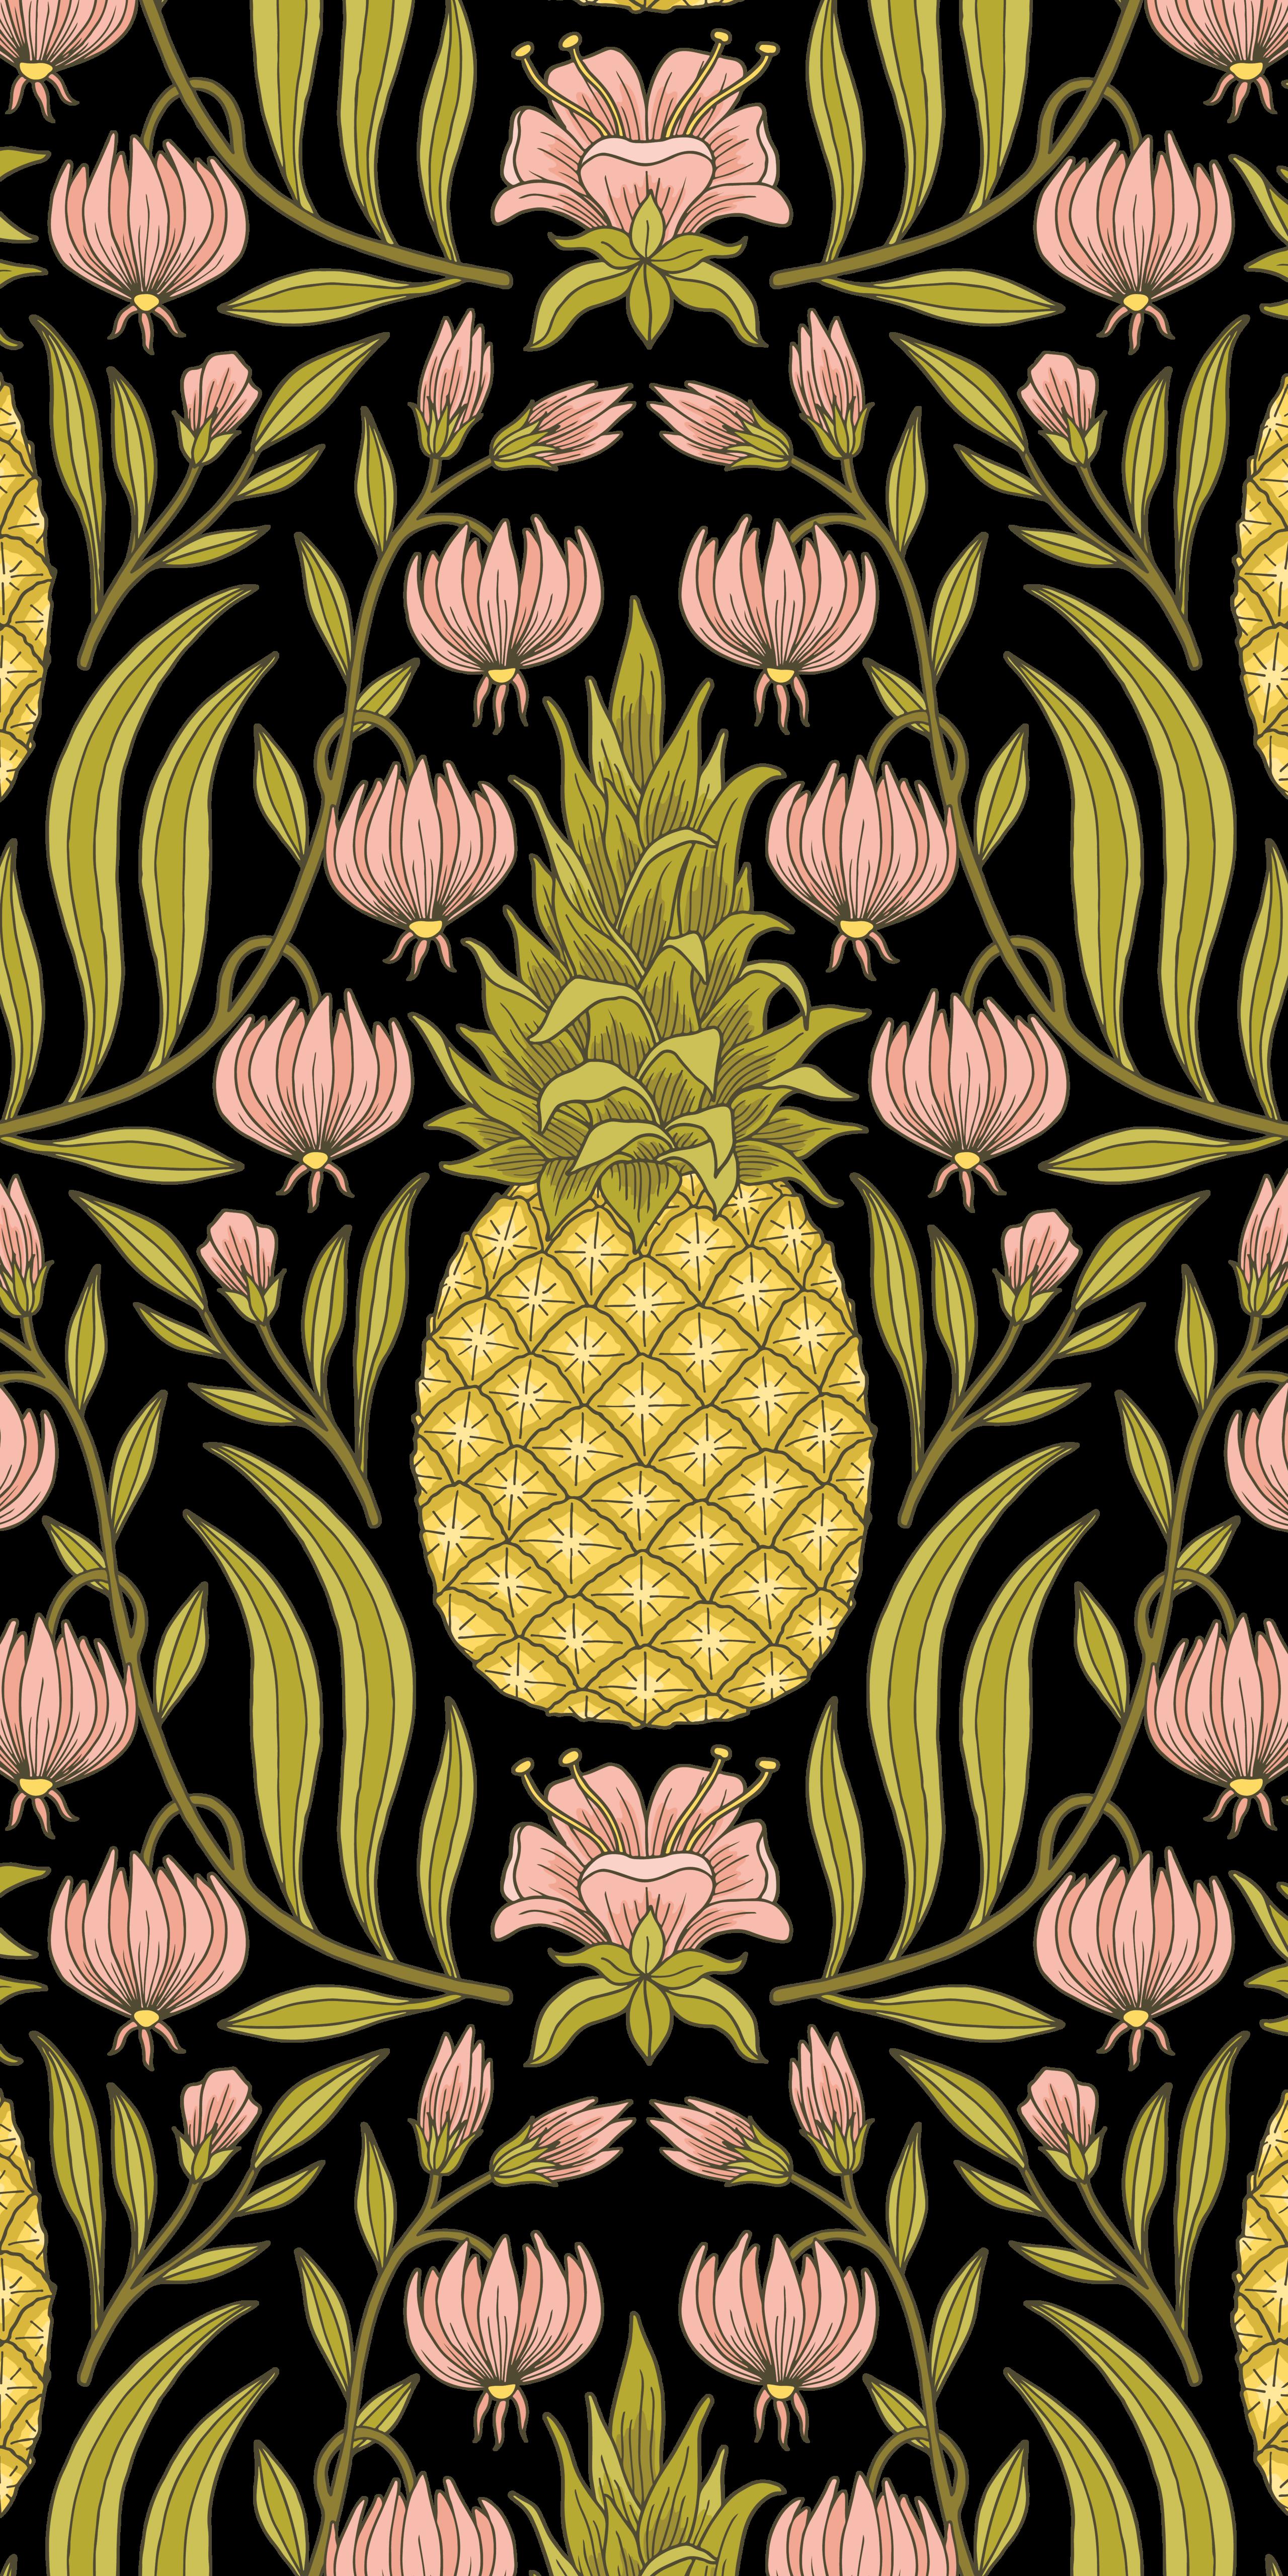 Floral Pineapple Casetify Iphone Art Design Drawing Fruit Flowers Flower Drawing Drawings Fruit Wallpaper